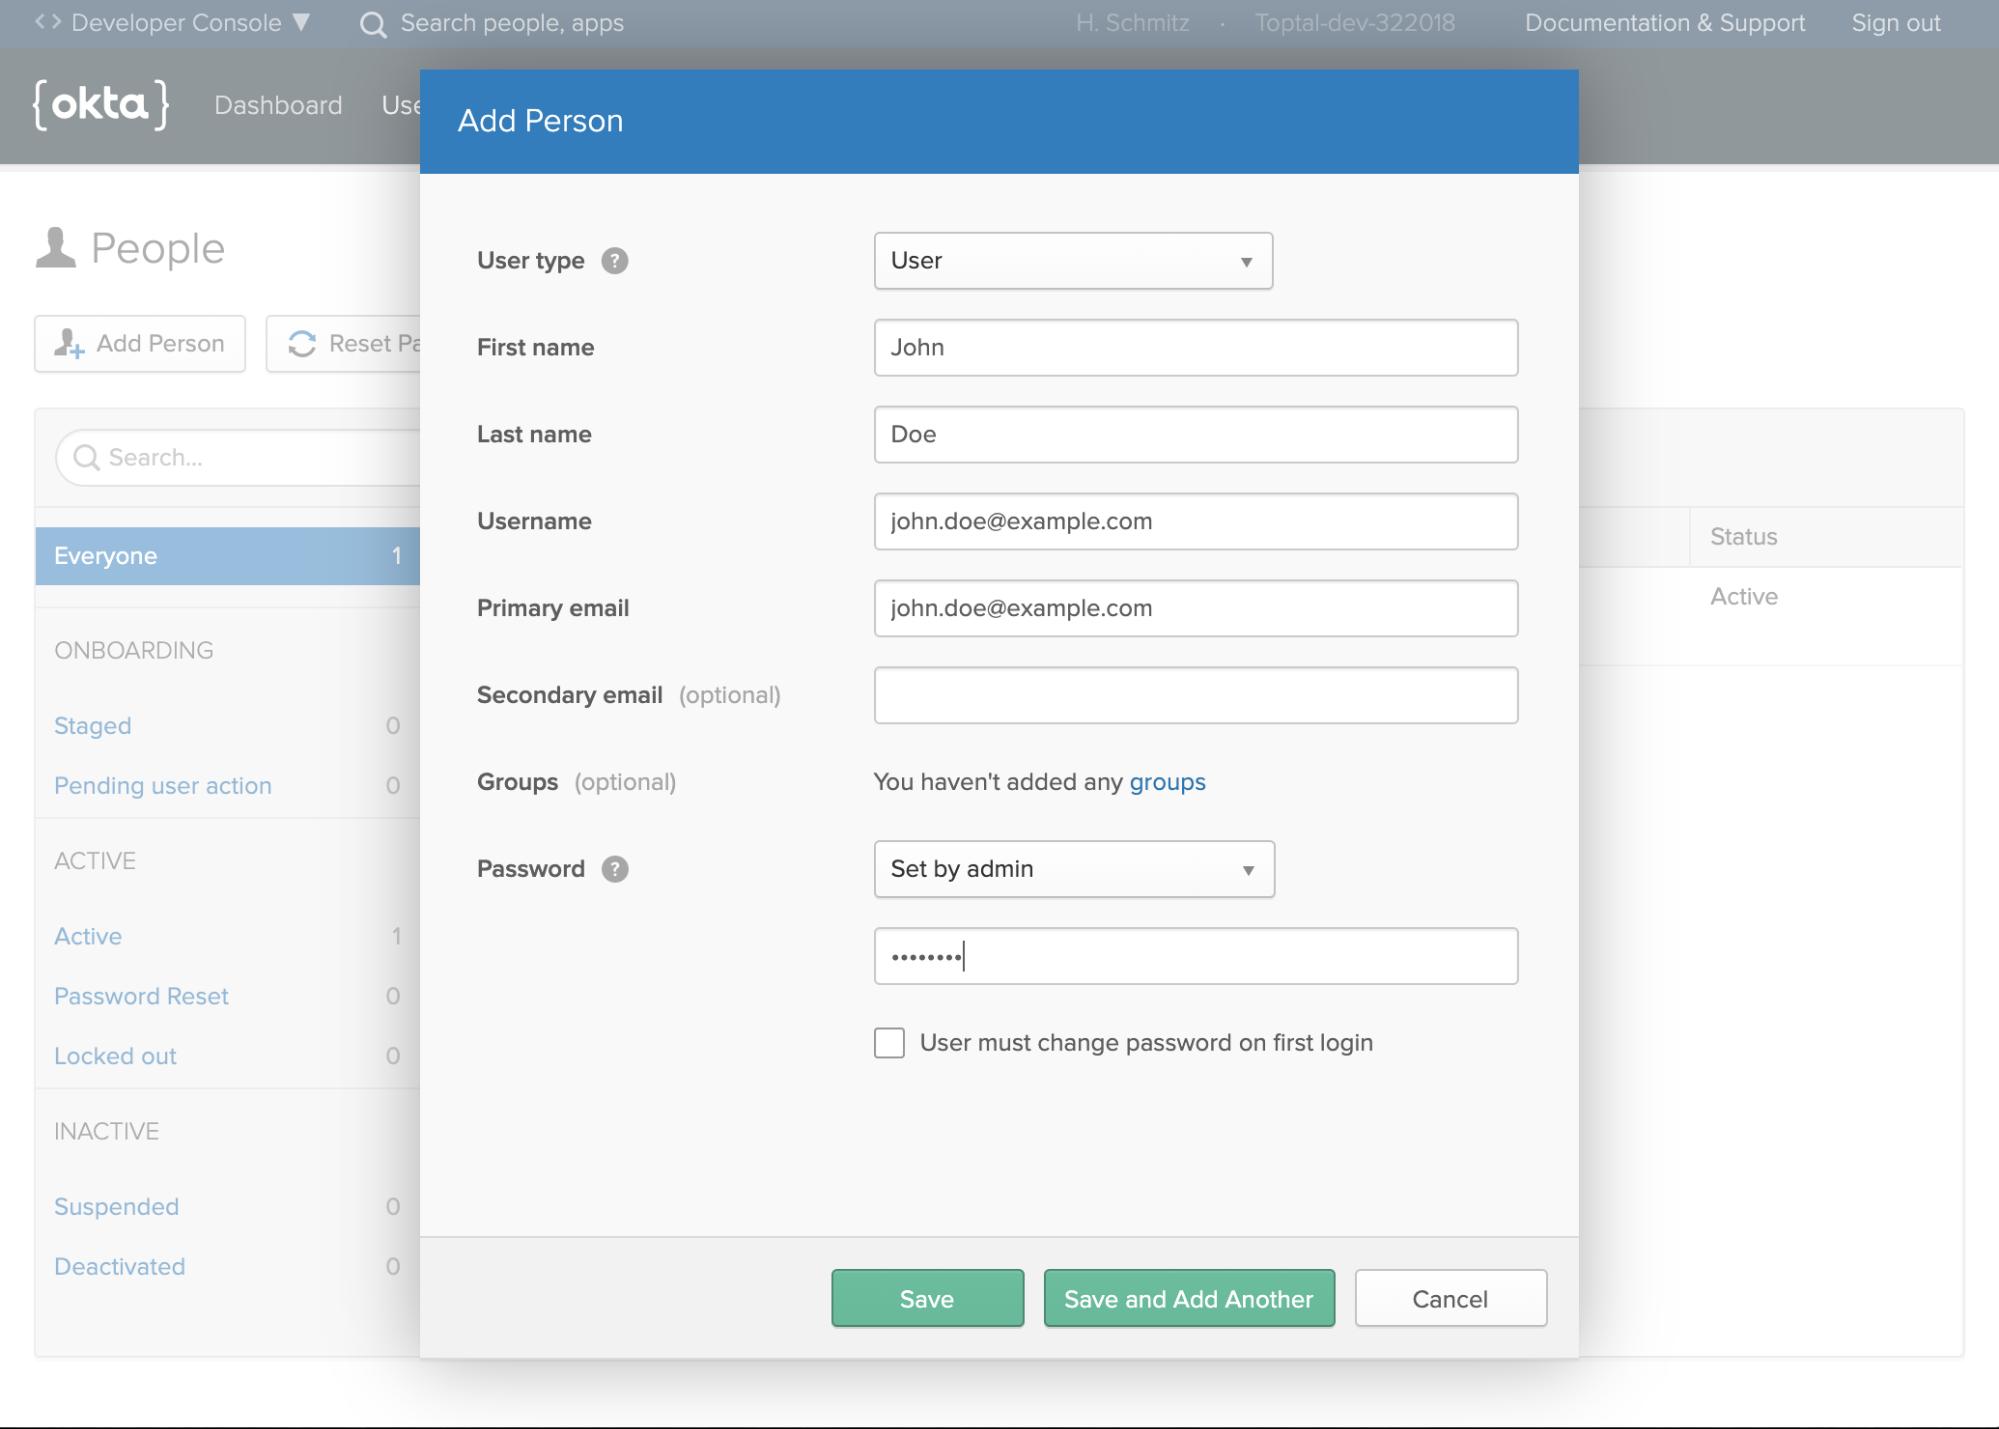 Creating a user profile on Okta